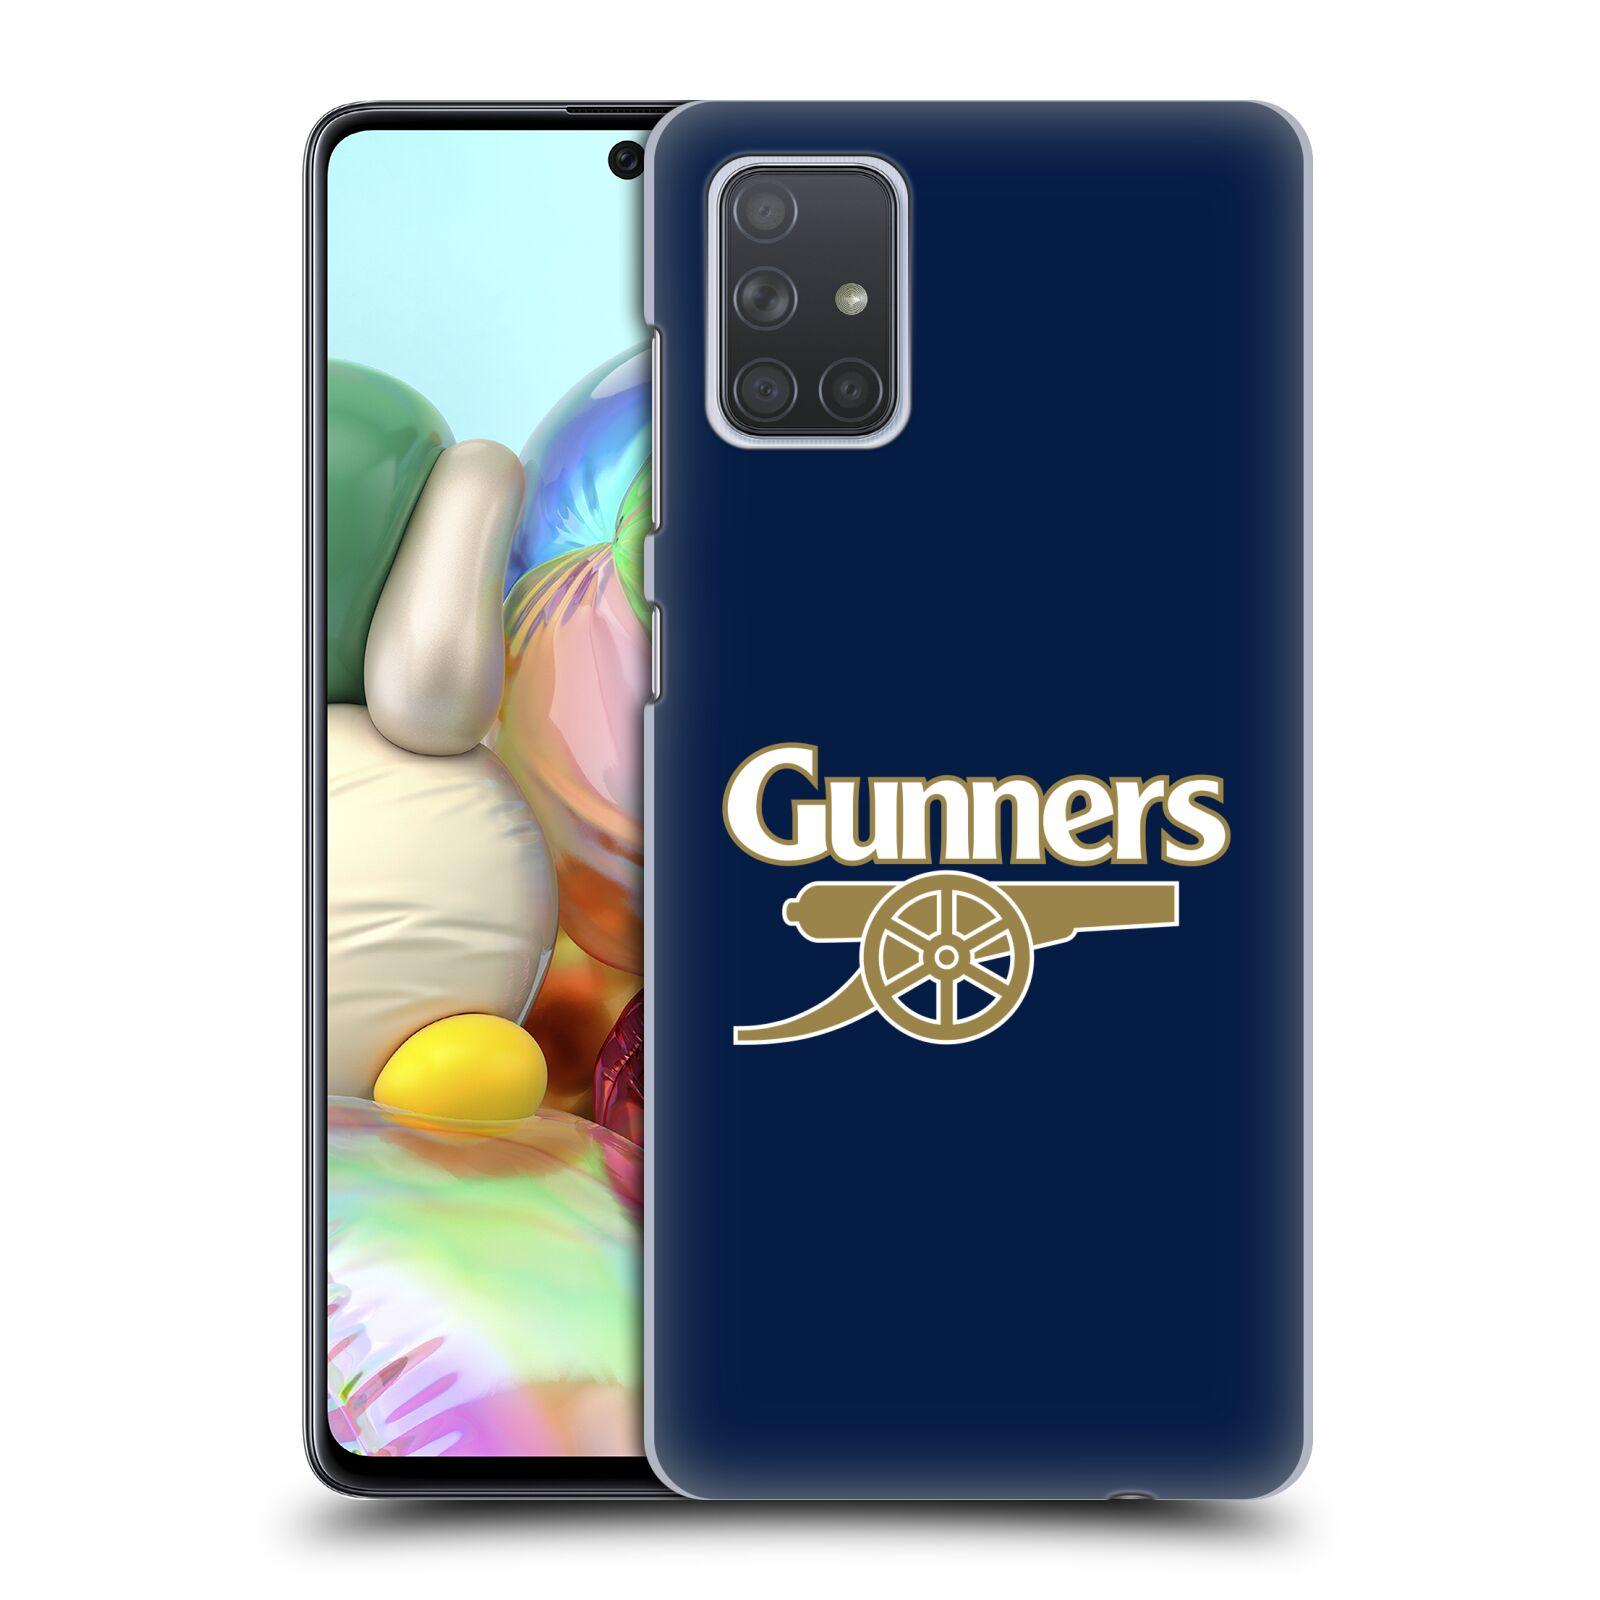 Plastové pouzdro na mobil Samsung Galaxy A71 - Head Case - Arsenal FC - Gunners